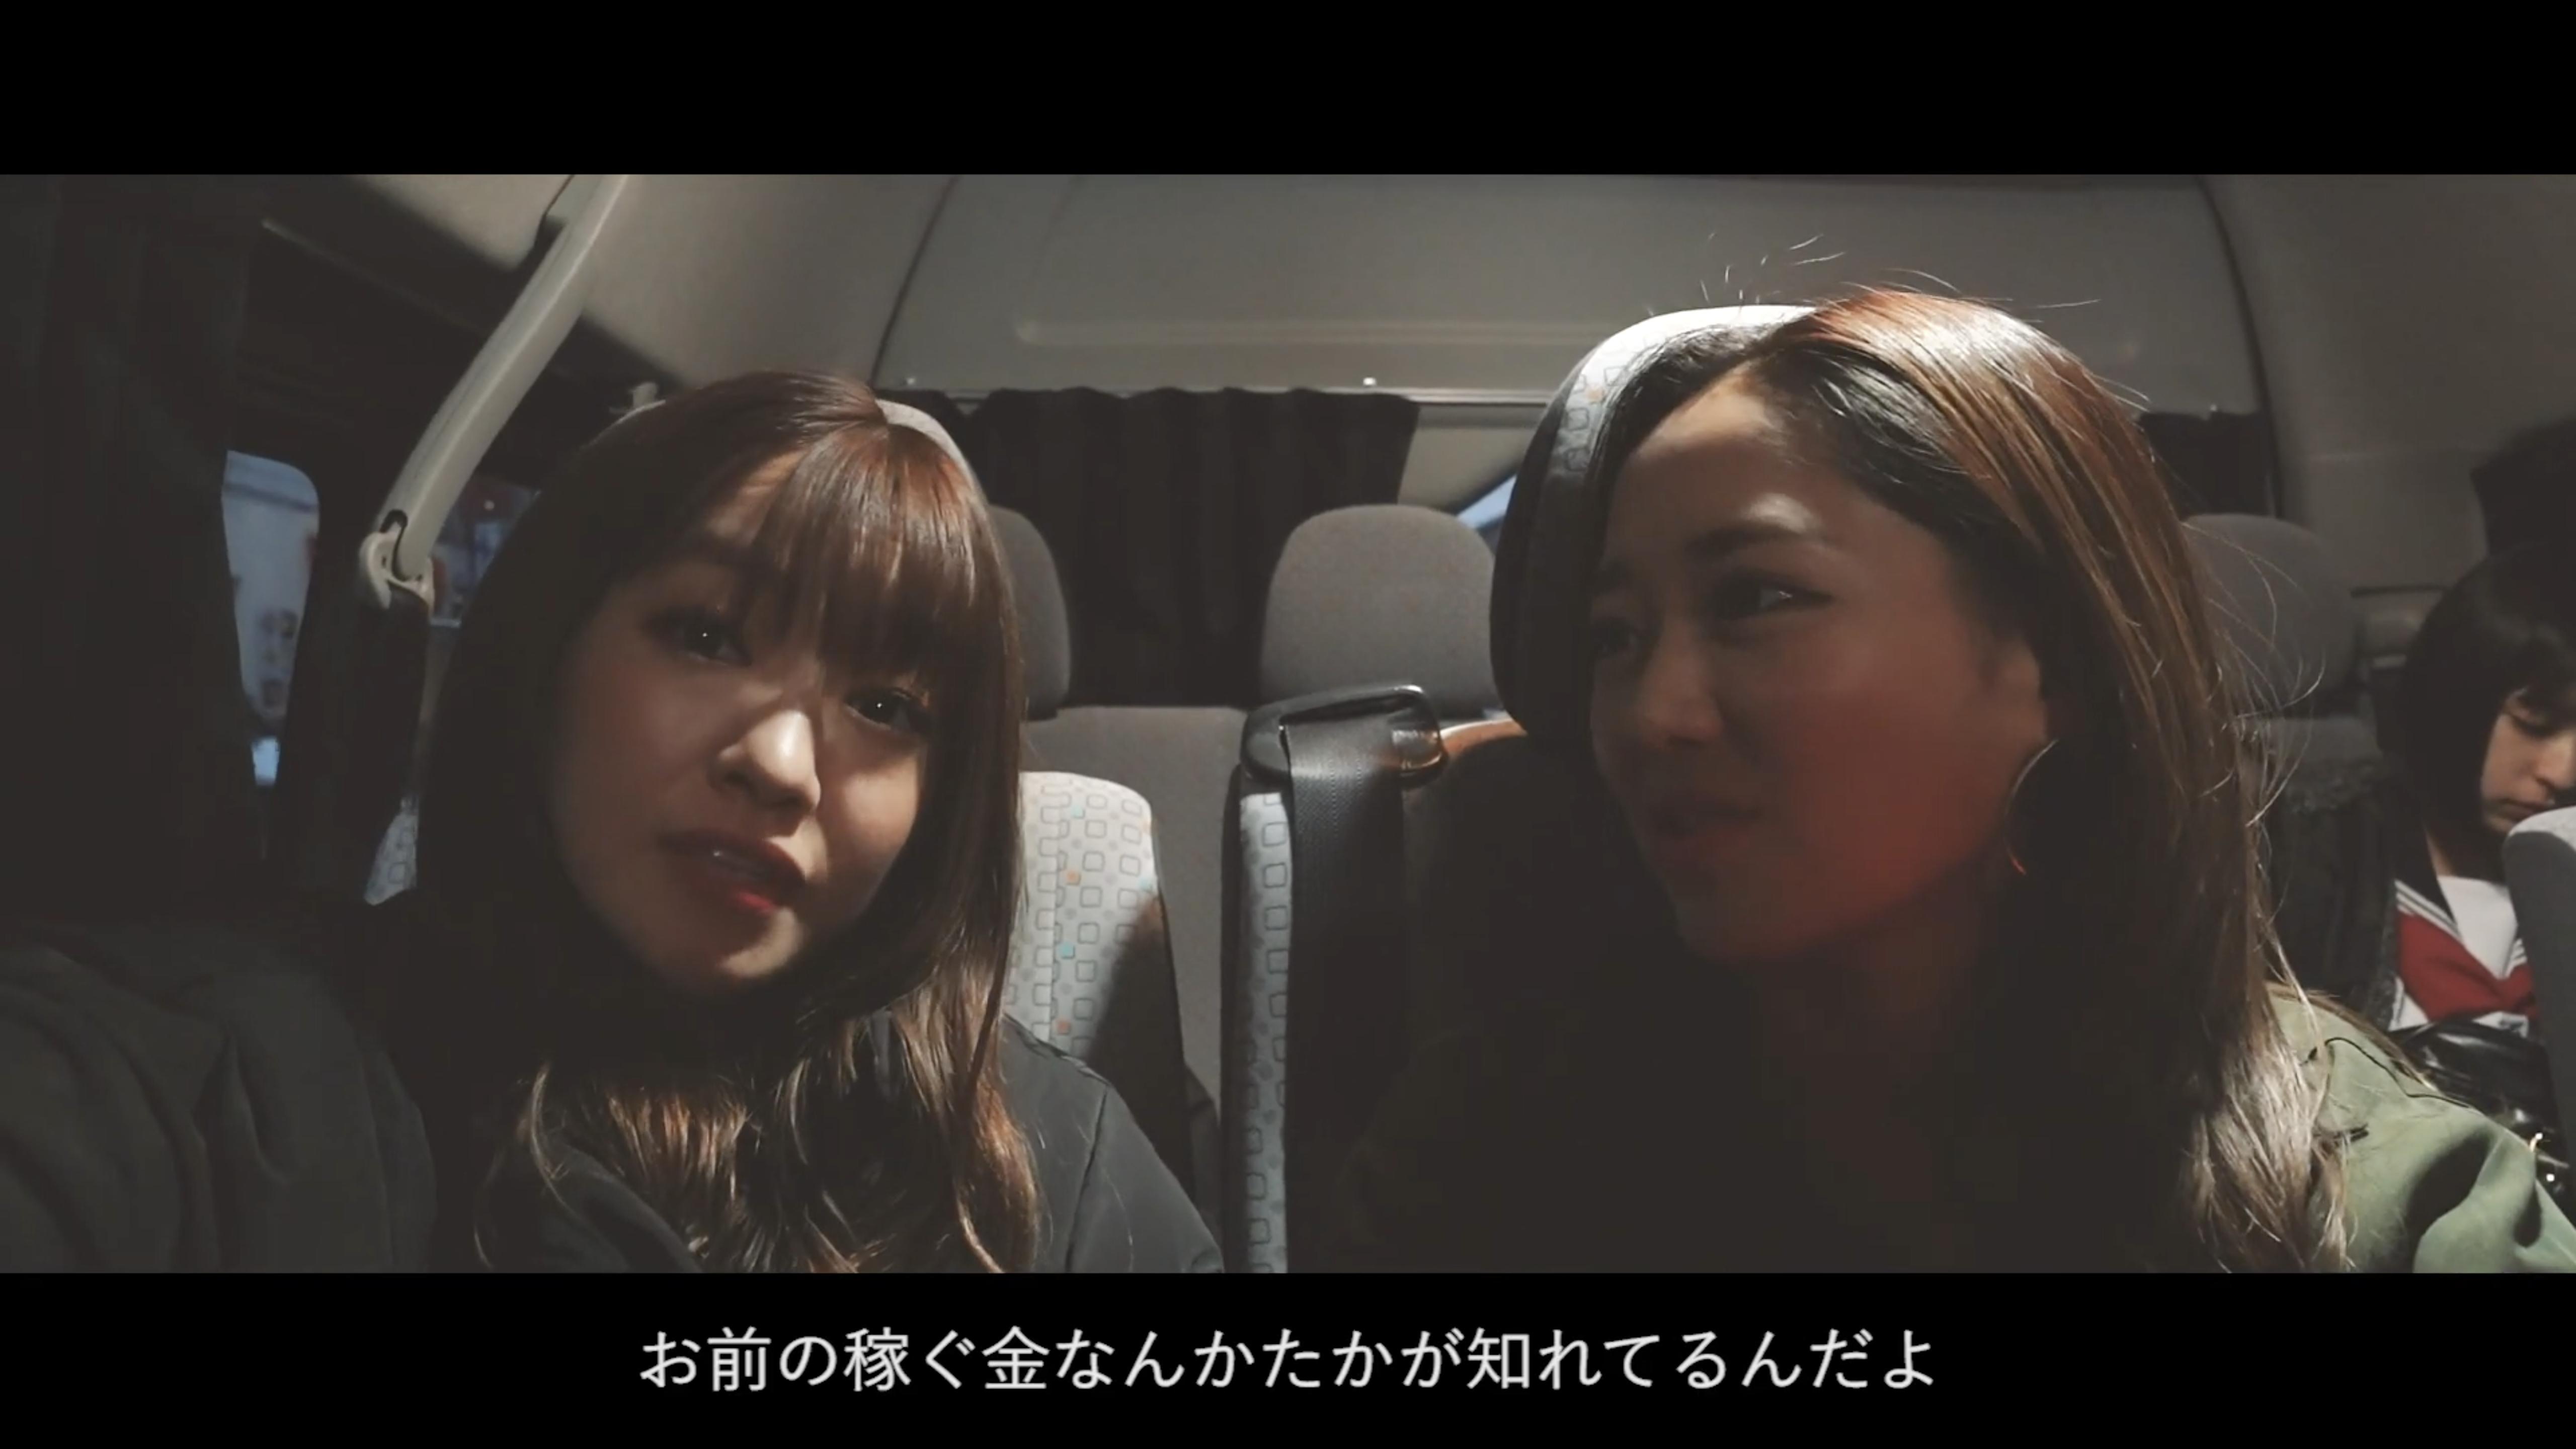 hy4_4yh(ハイパーヨーヨ)ドキュメンタリー第4話 画像01